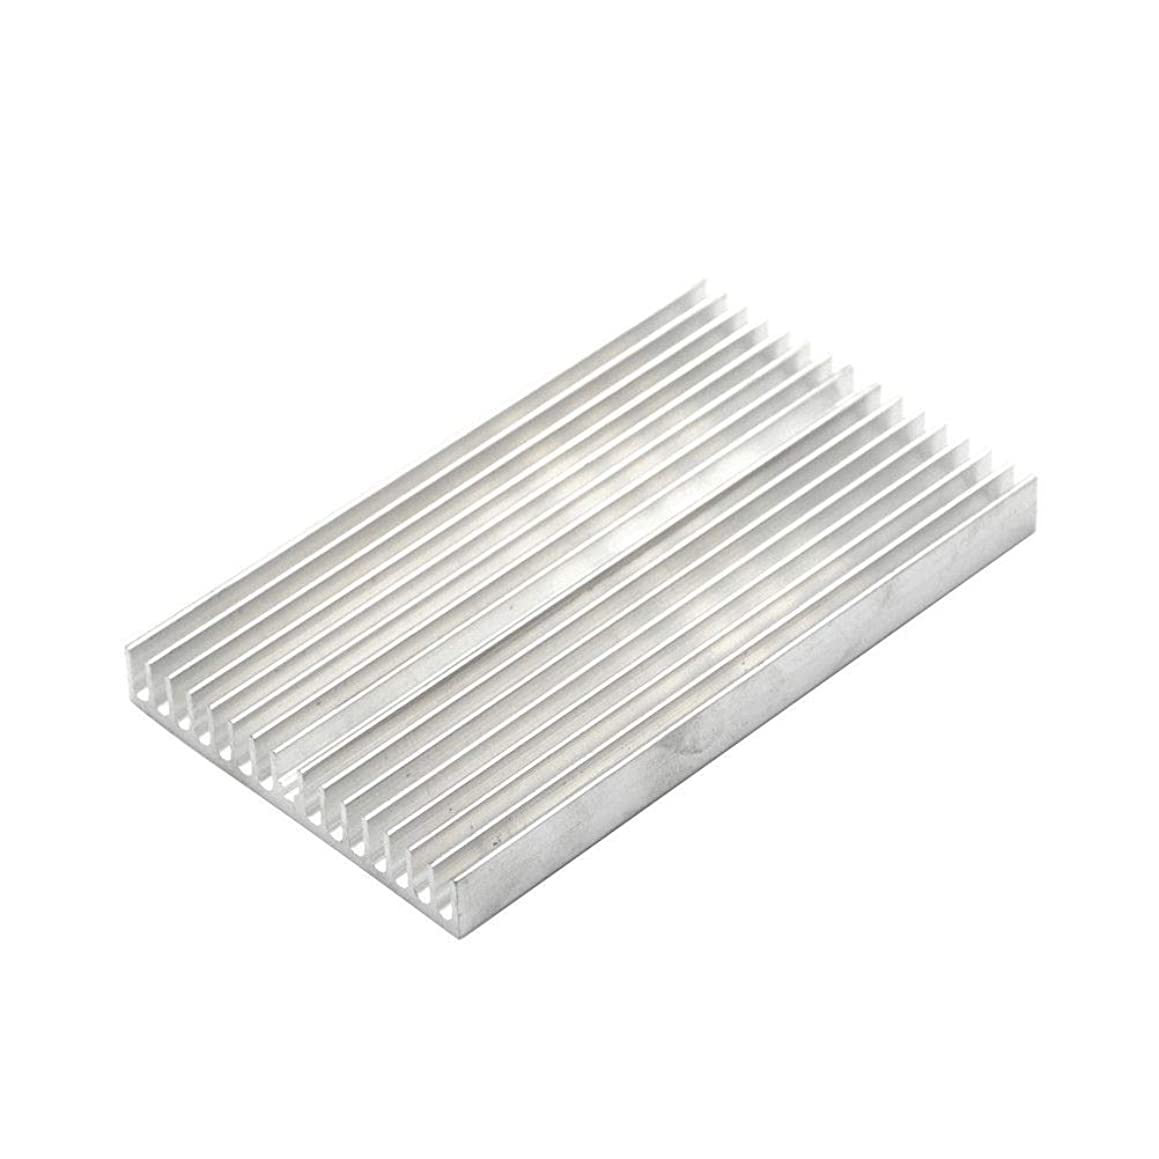 1pcs Silver Tone Aluminum Heatsink Cooler Radiator Heat Sink Heatsink Adhesive Glue 100x60x10mm